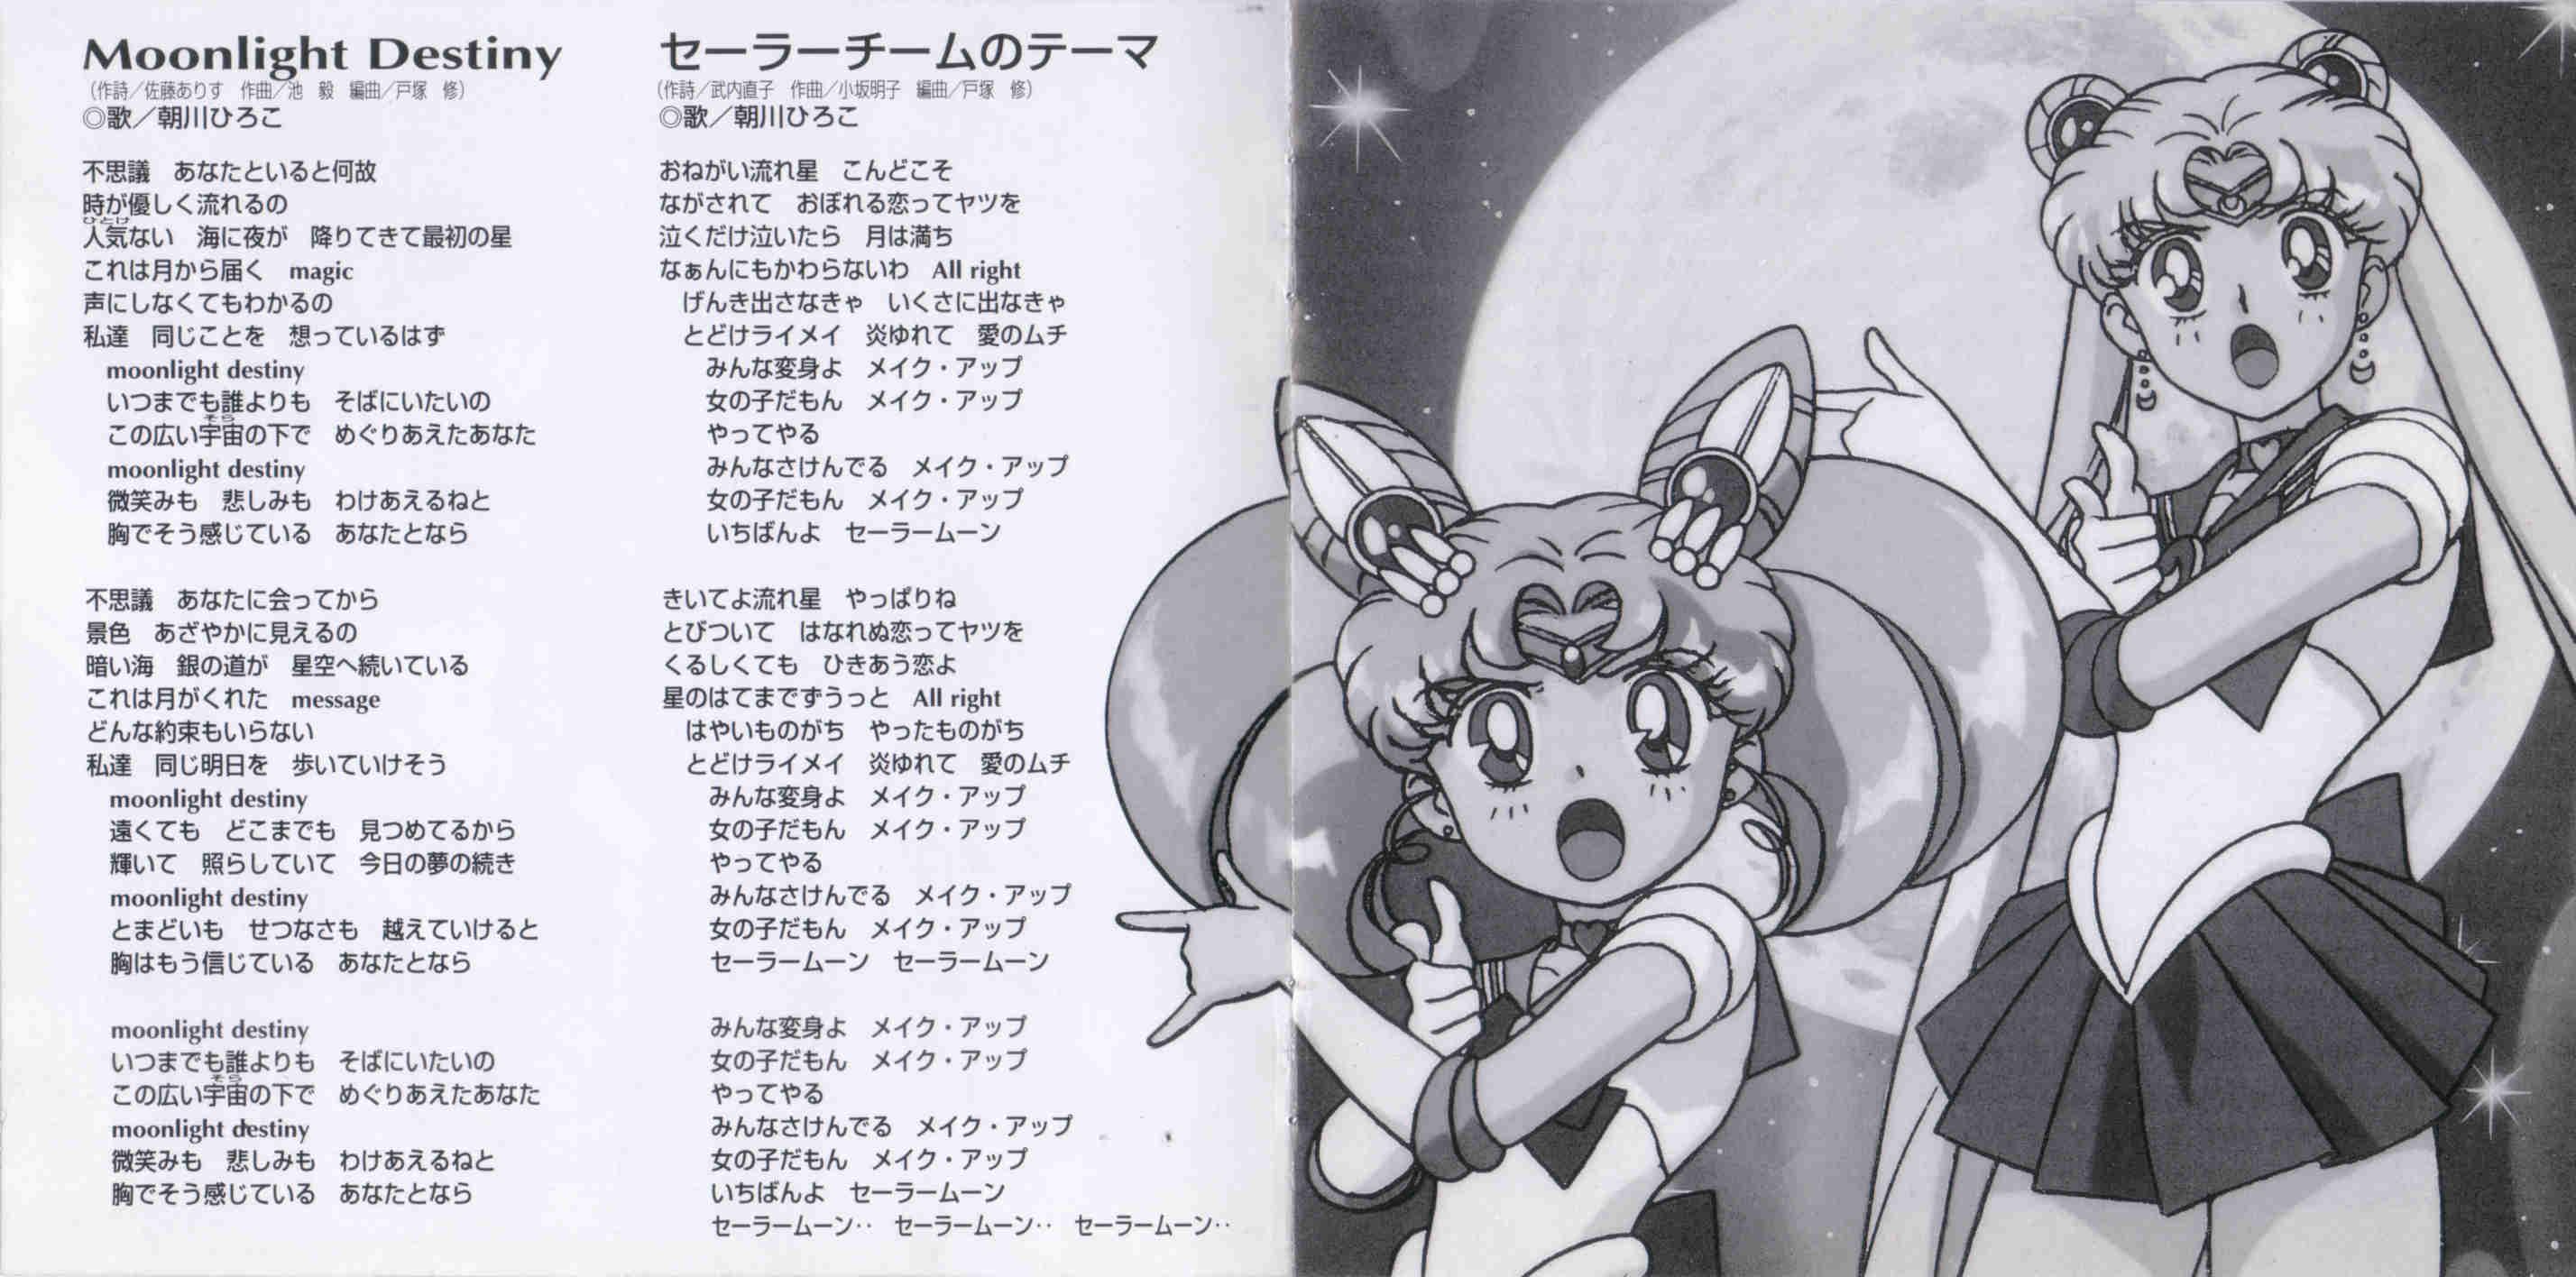 Download] BISHOUJO SENSHI SAILOR MOON S THE MOVIE MUSIC